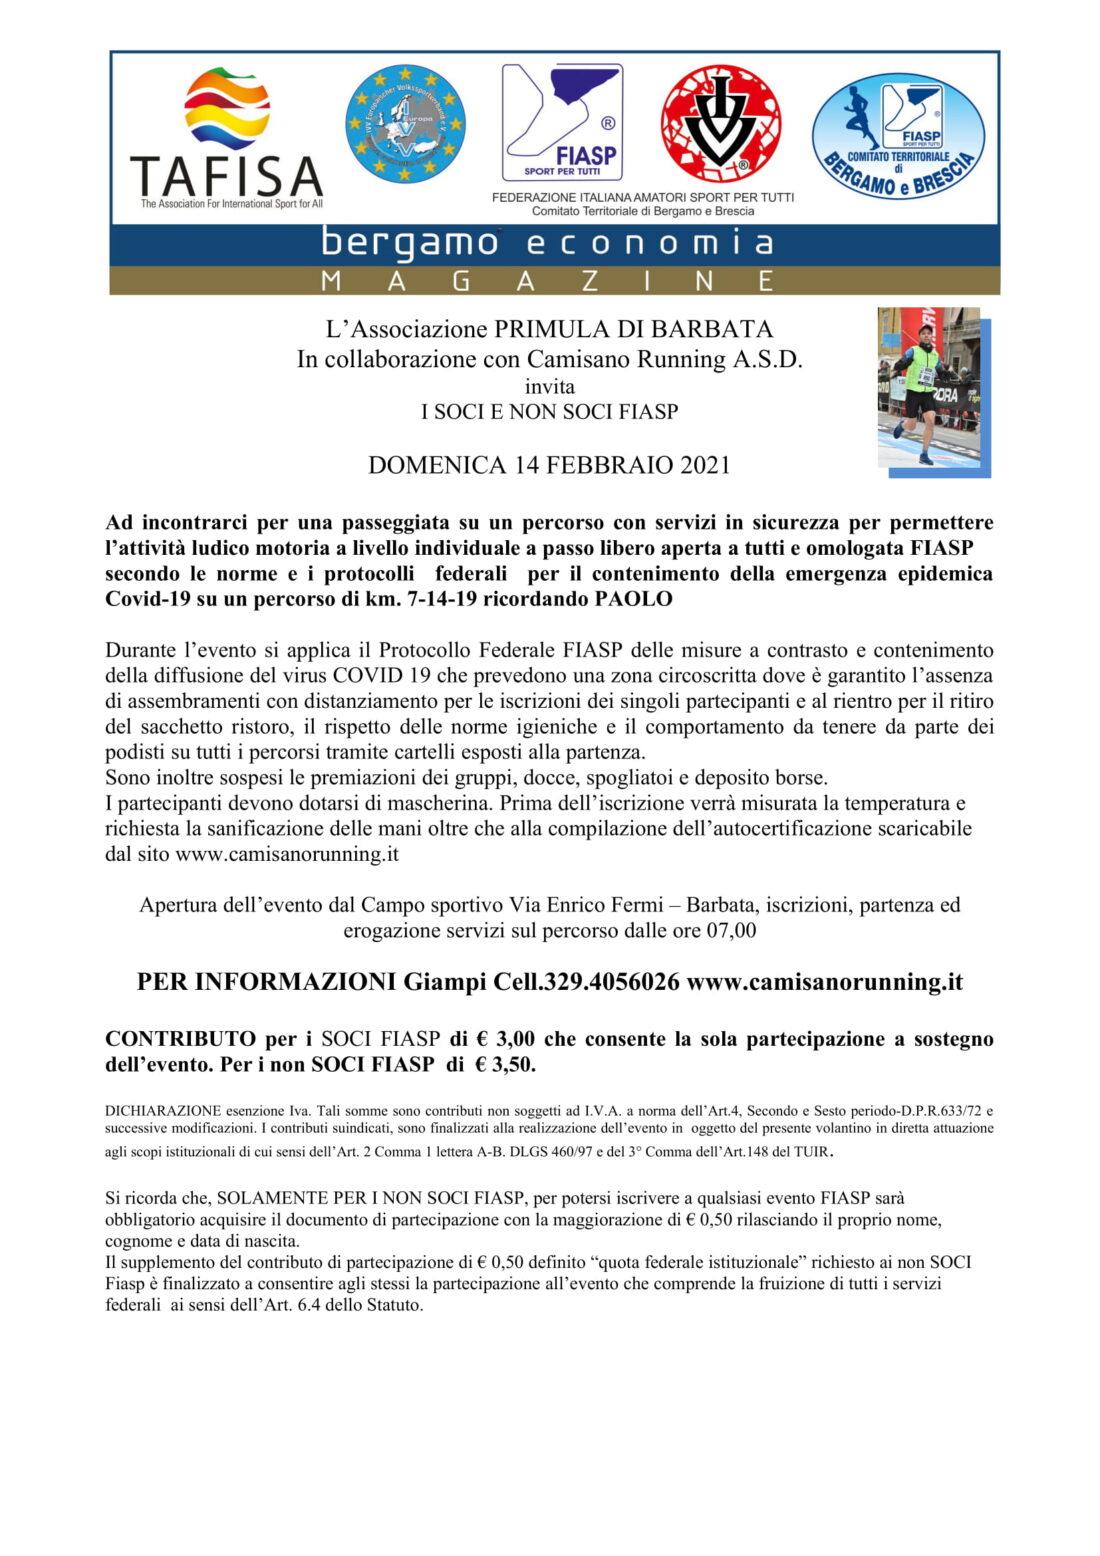 "14° marcia ""Barbada Fest, al Pass, al Trot, al Fresc. memorial"